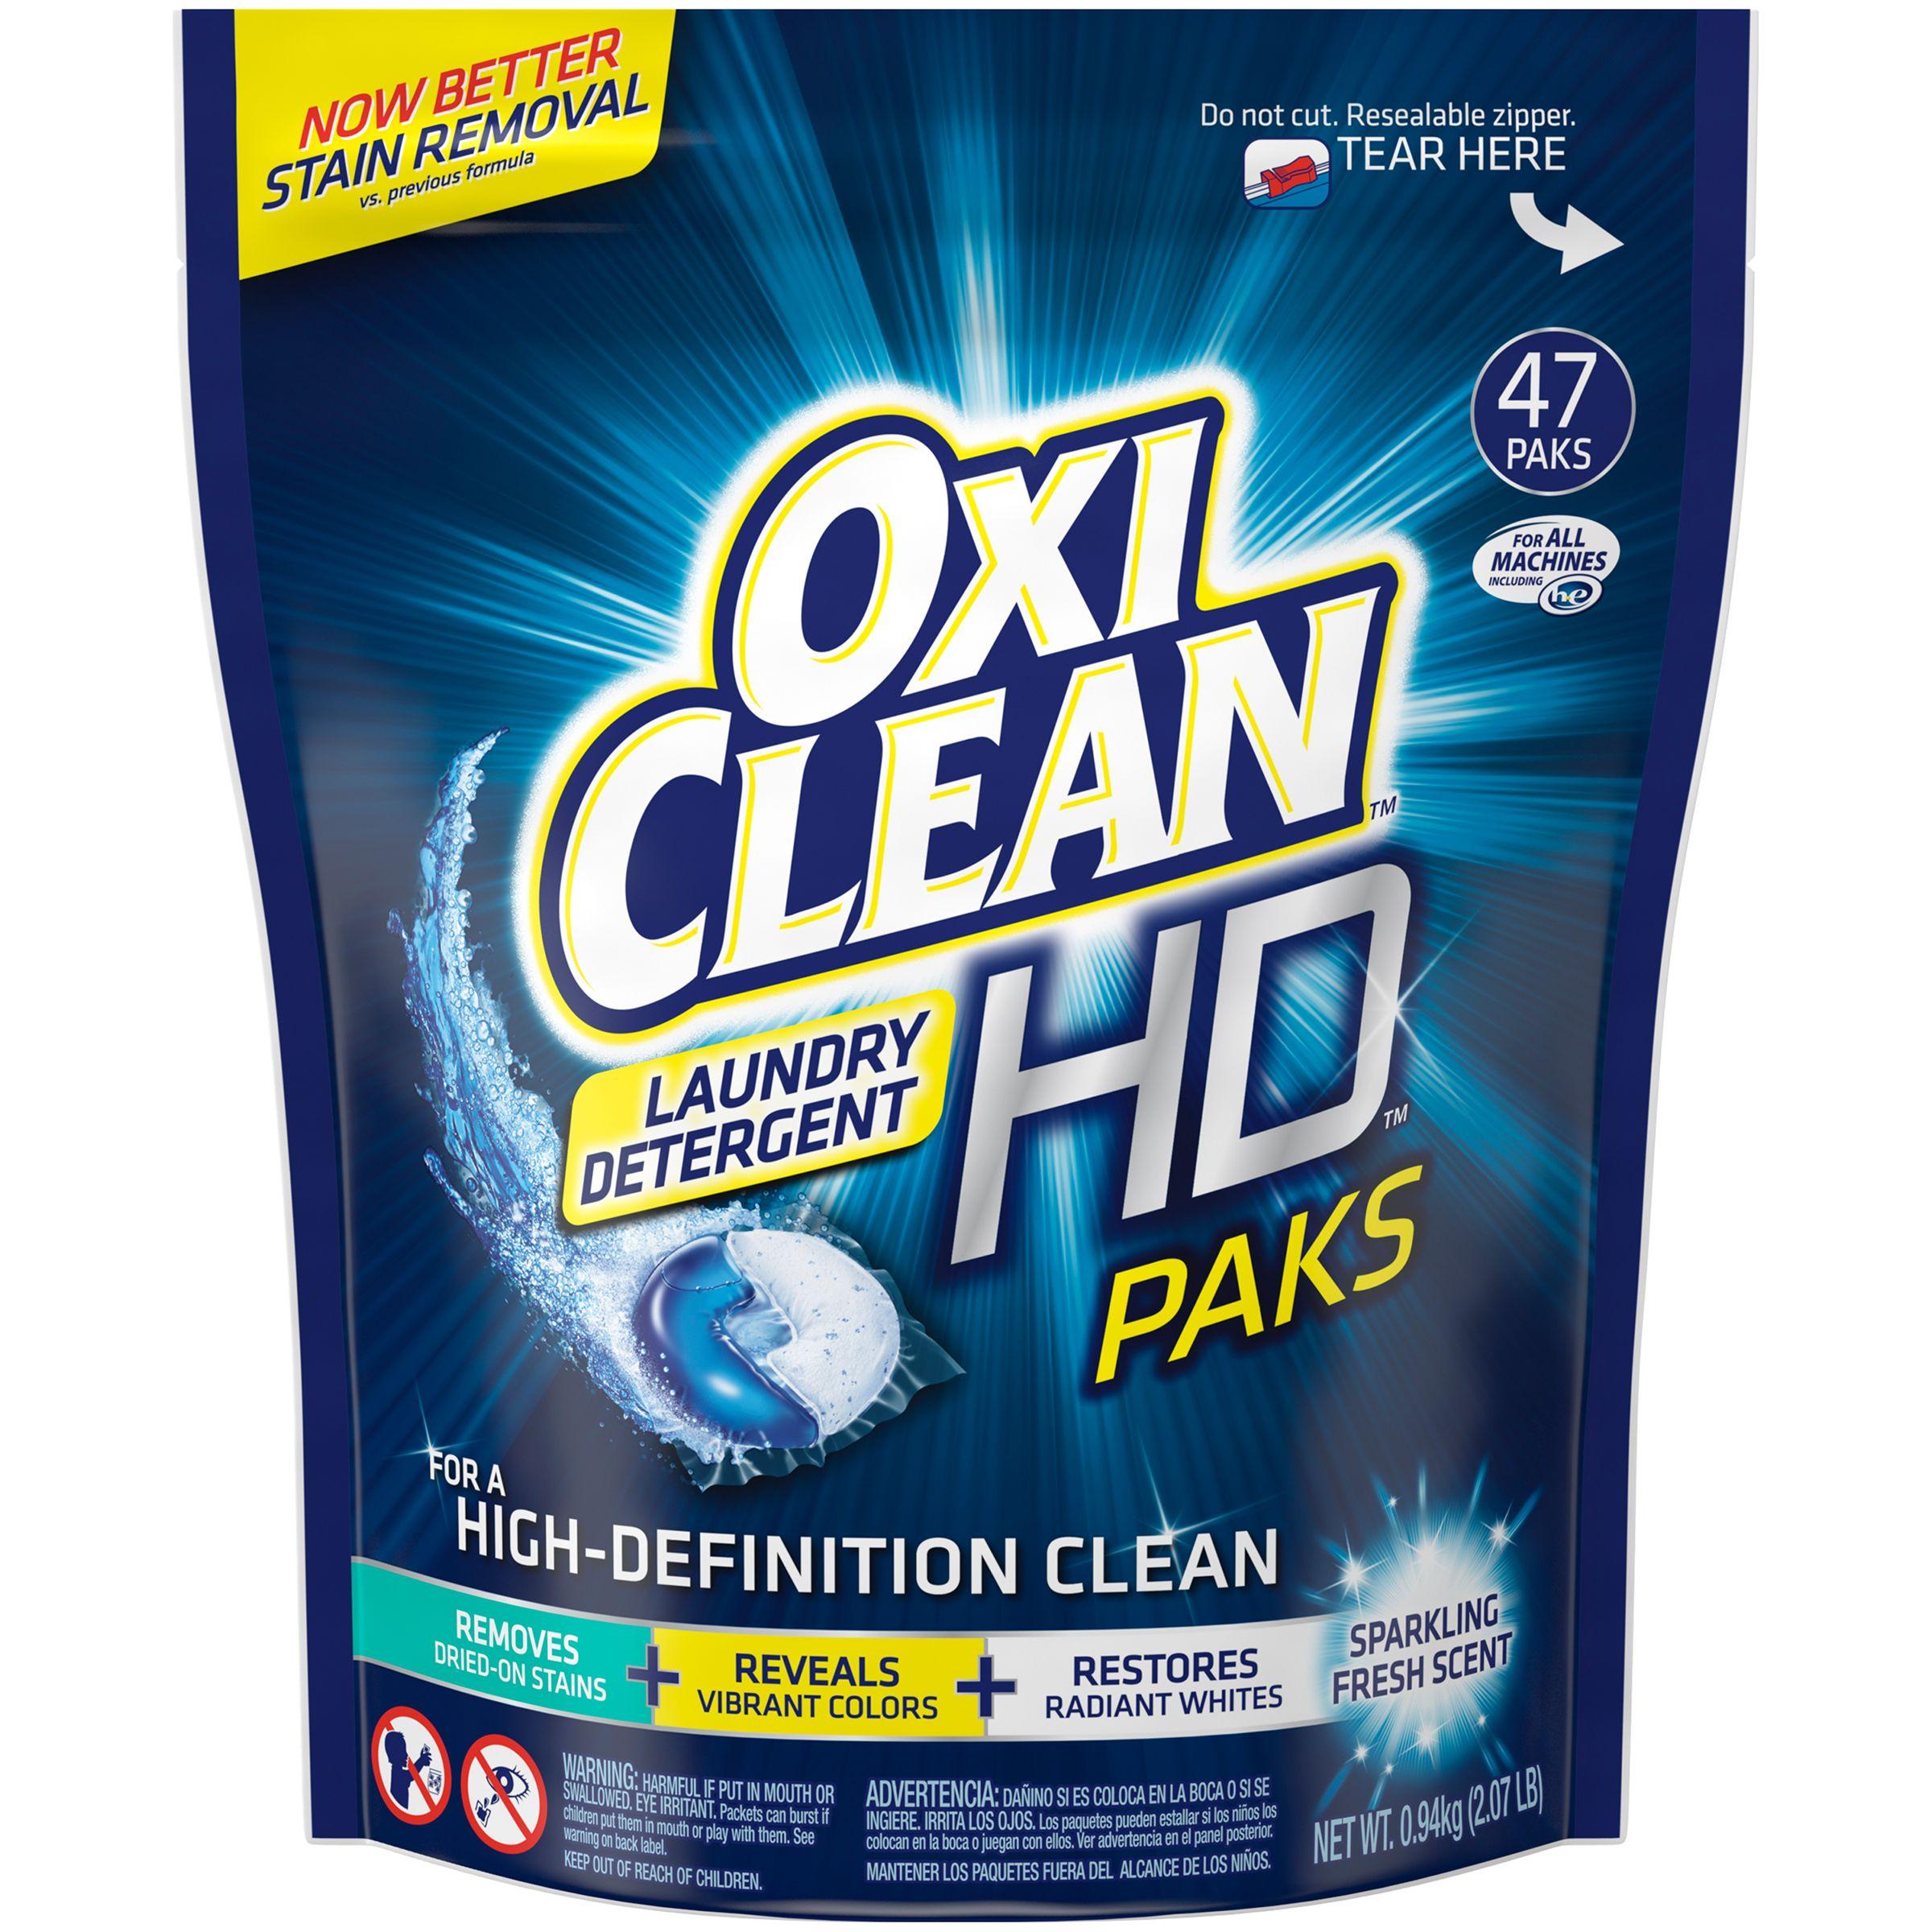 Oxi Clean Sparkling Fresh Scent Hd Paks Laundry Detergent 47 Ct